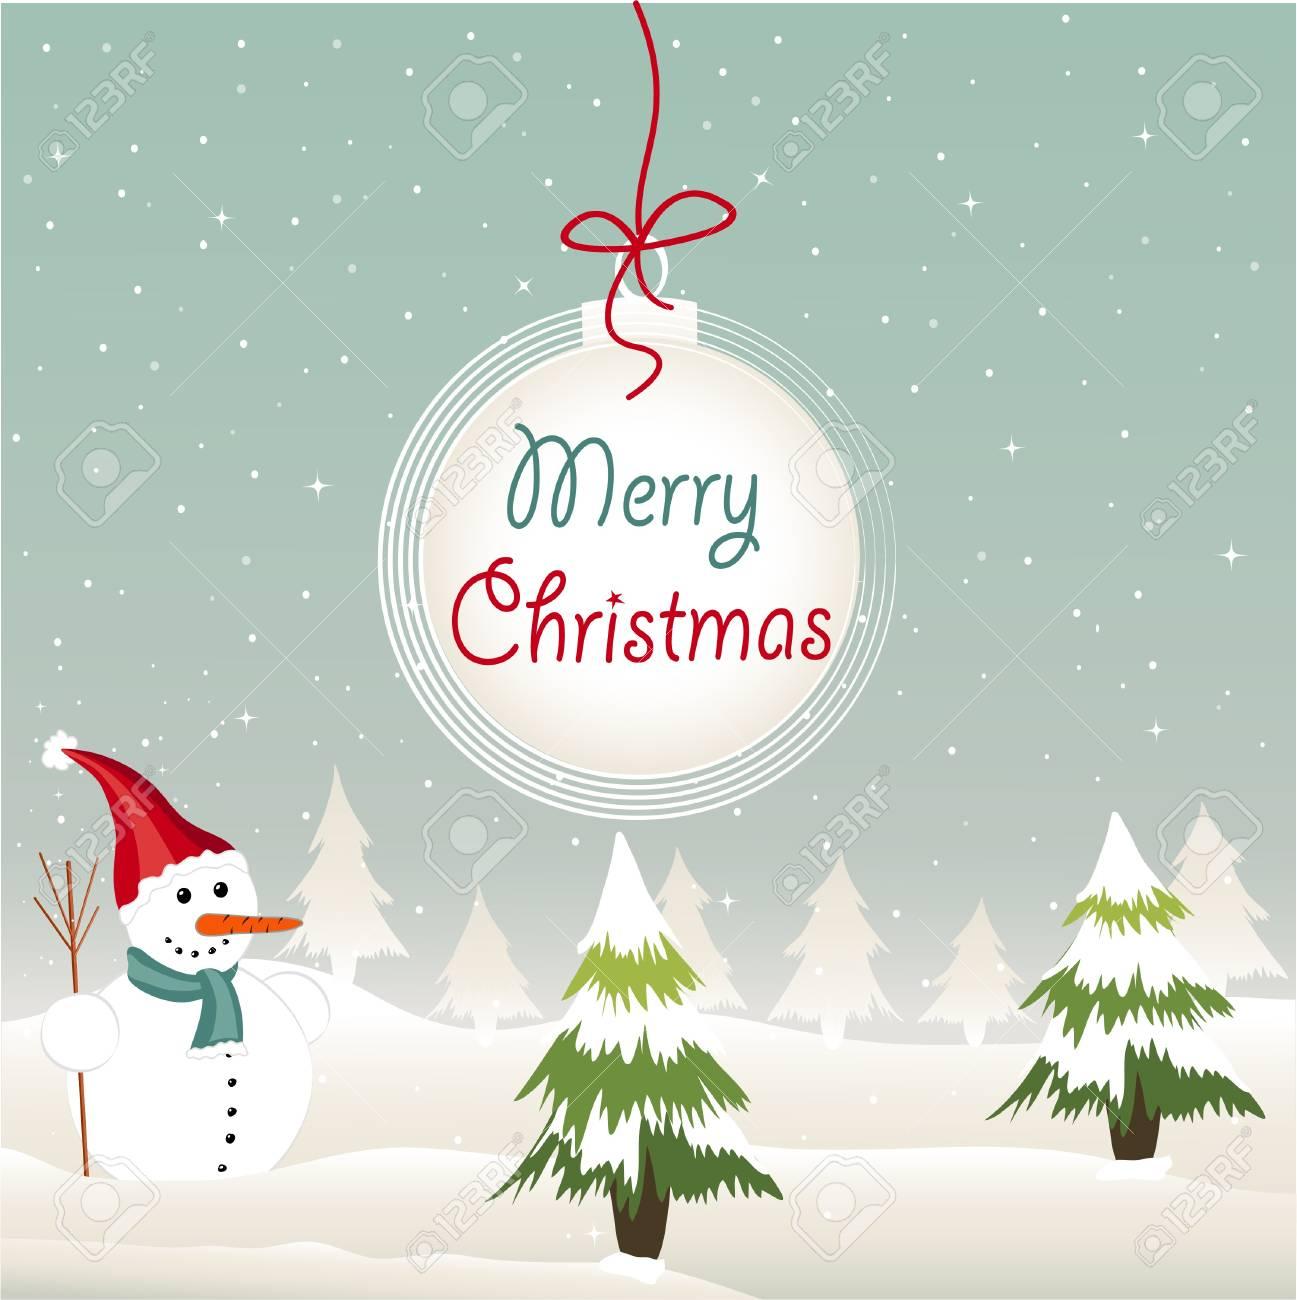 Merry Christmas Stock Vector - 16910828